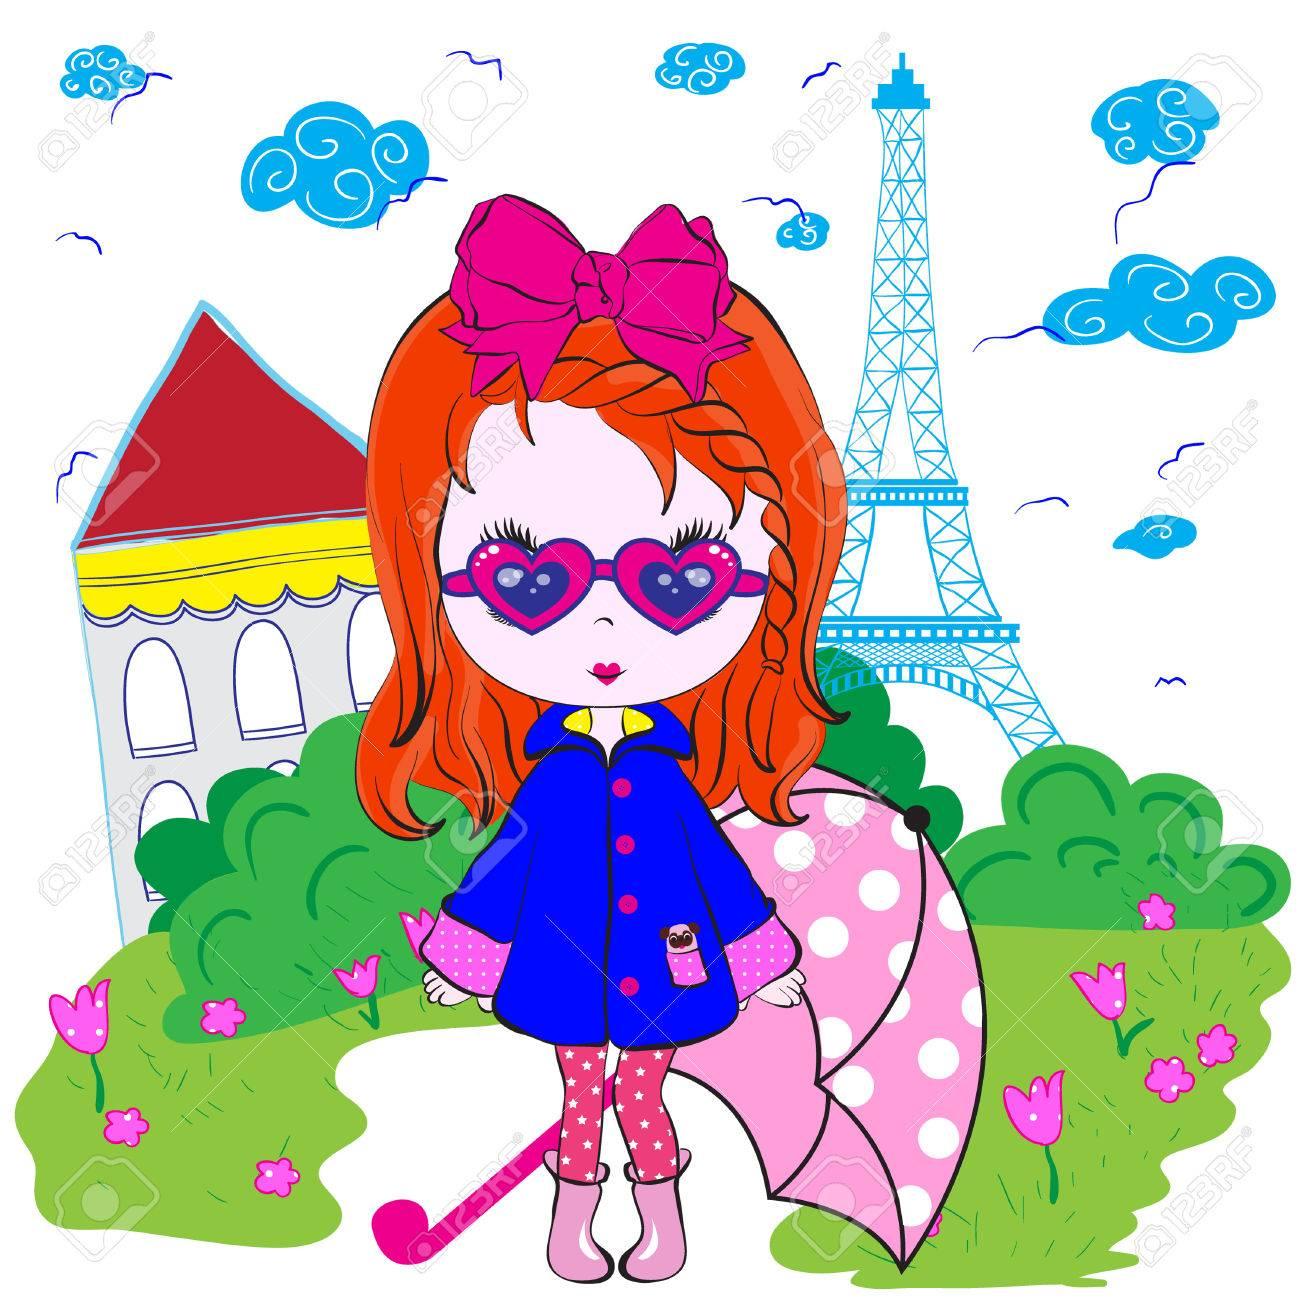 Shirt design in girl - Kids Girl Paris Teenage T Shirt Design Stock Vector 32485592